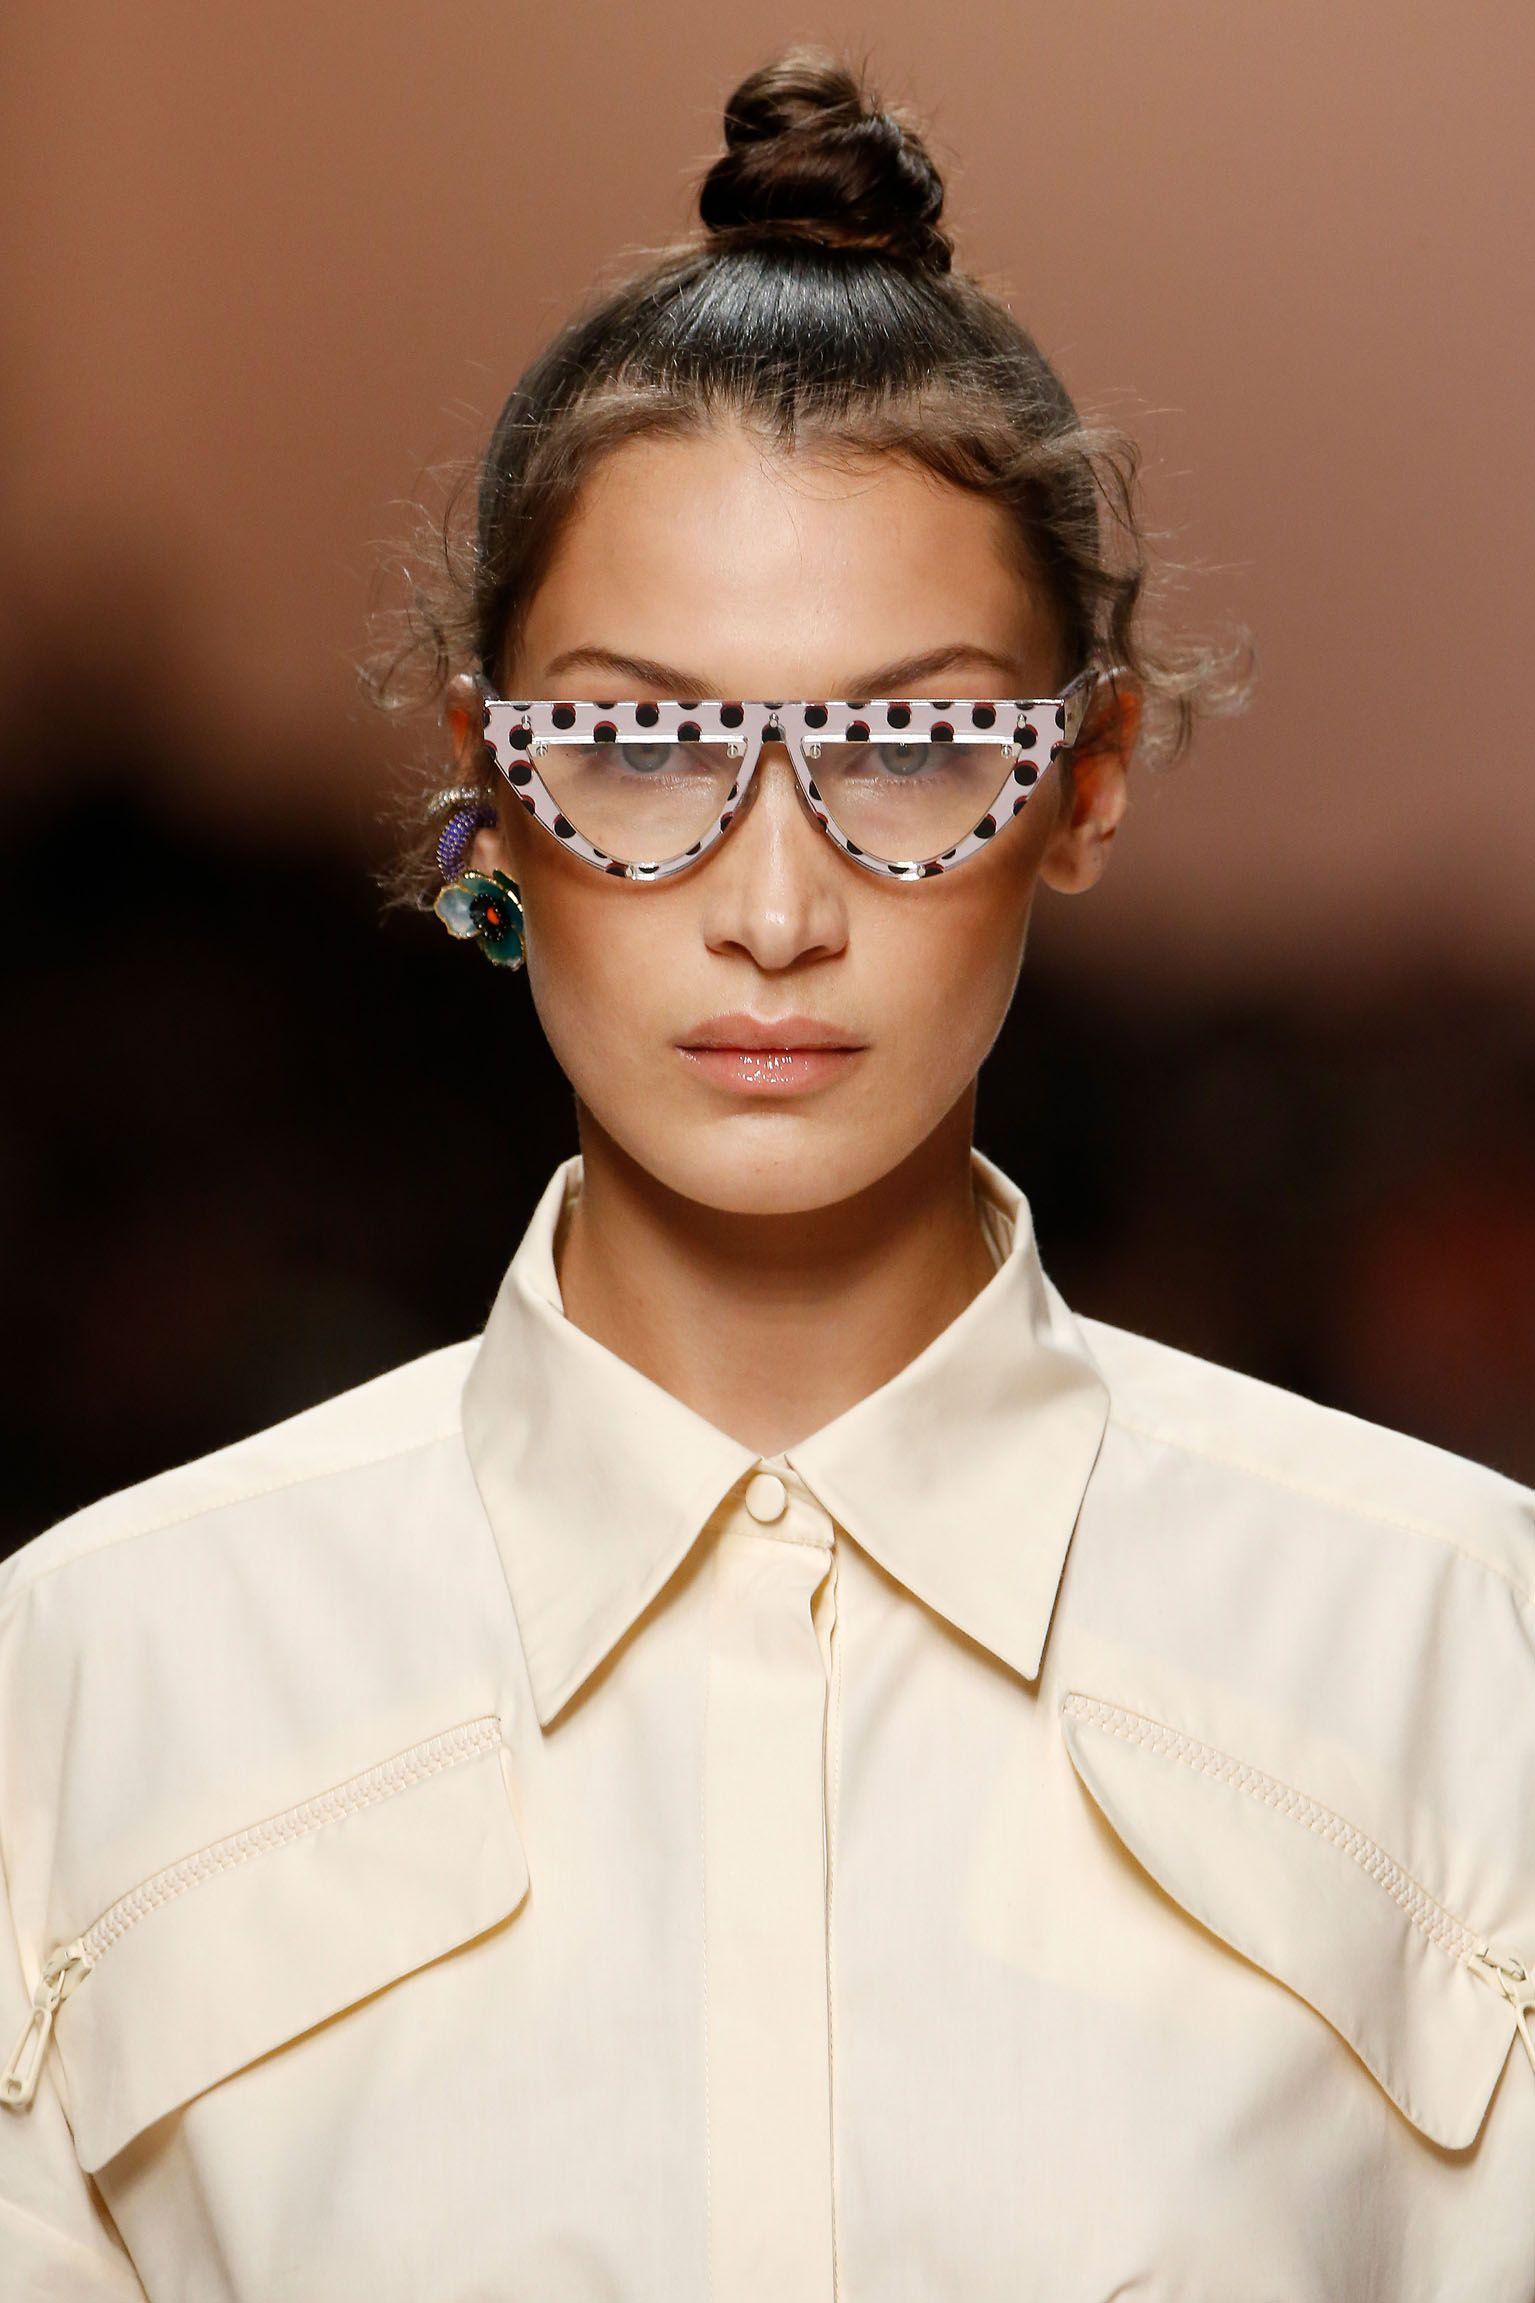 fb614a7ed92d6 Fendi Women s Spring Summer 2019 Fashion Show